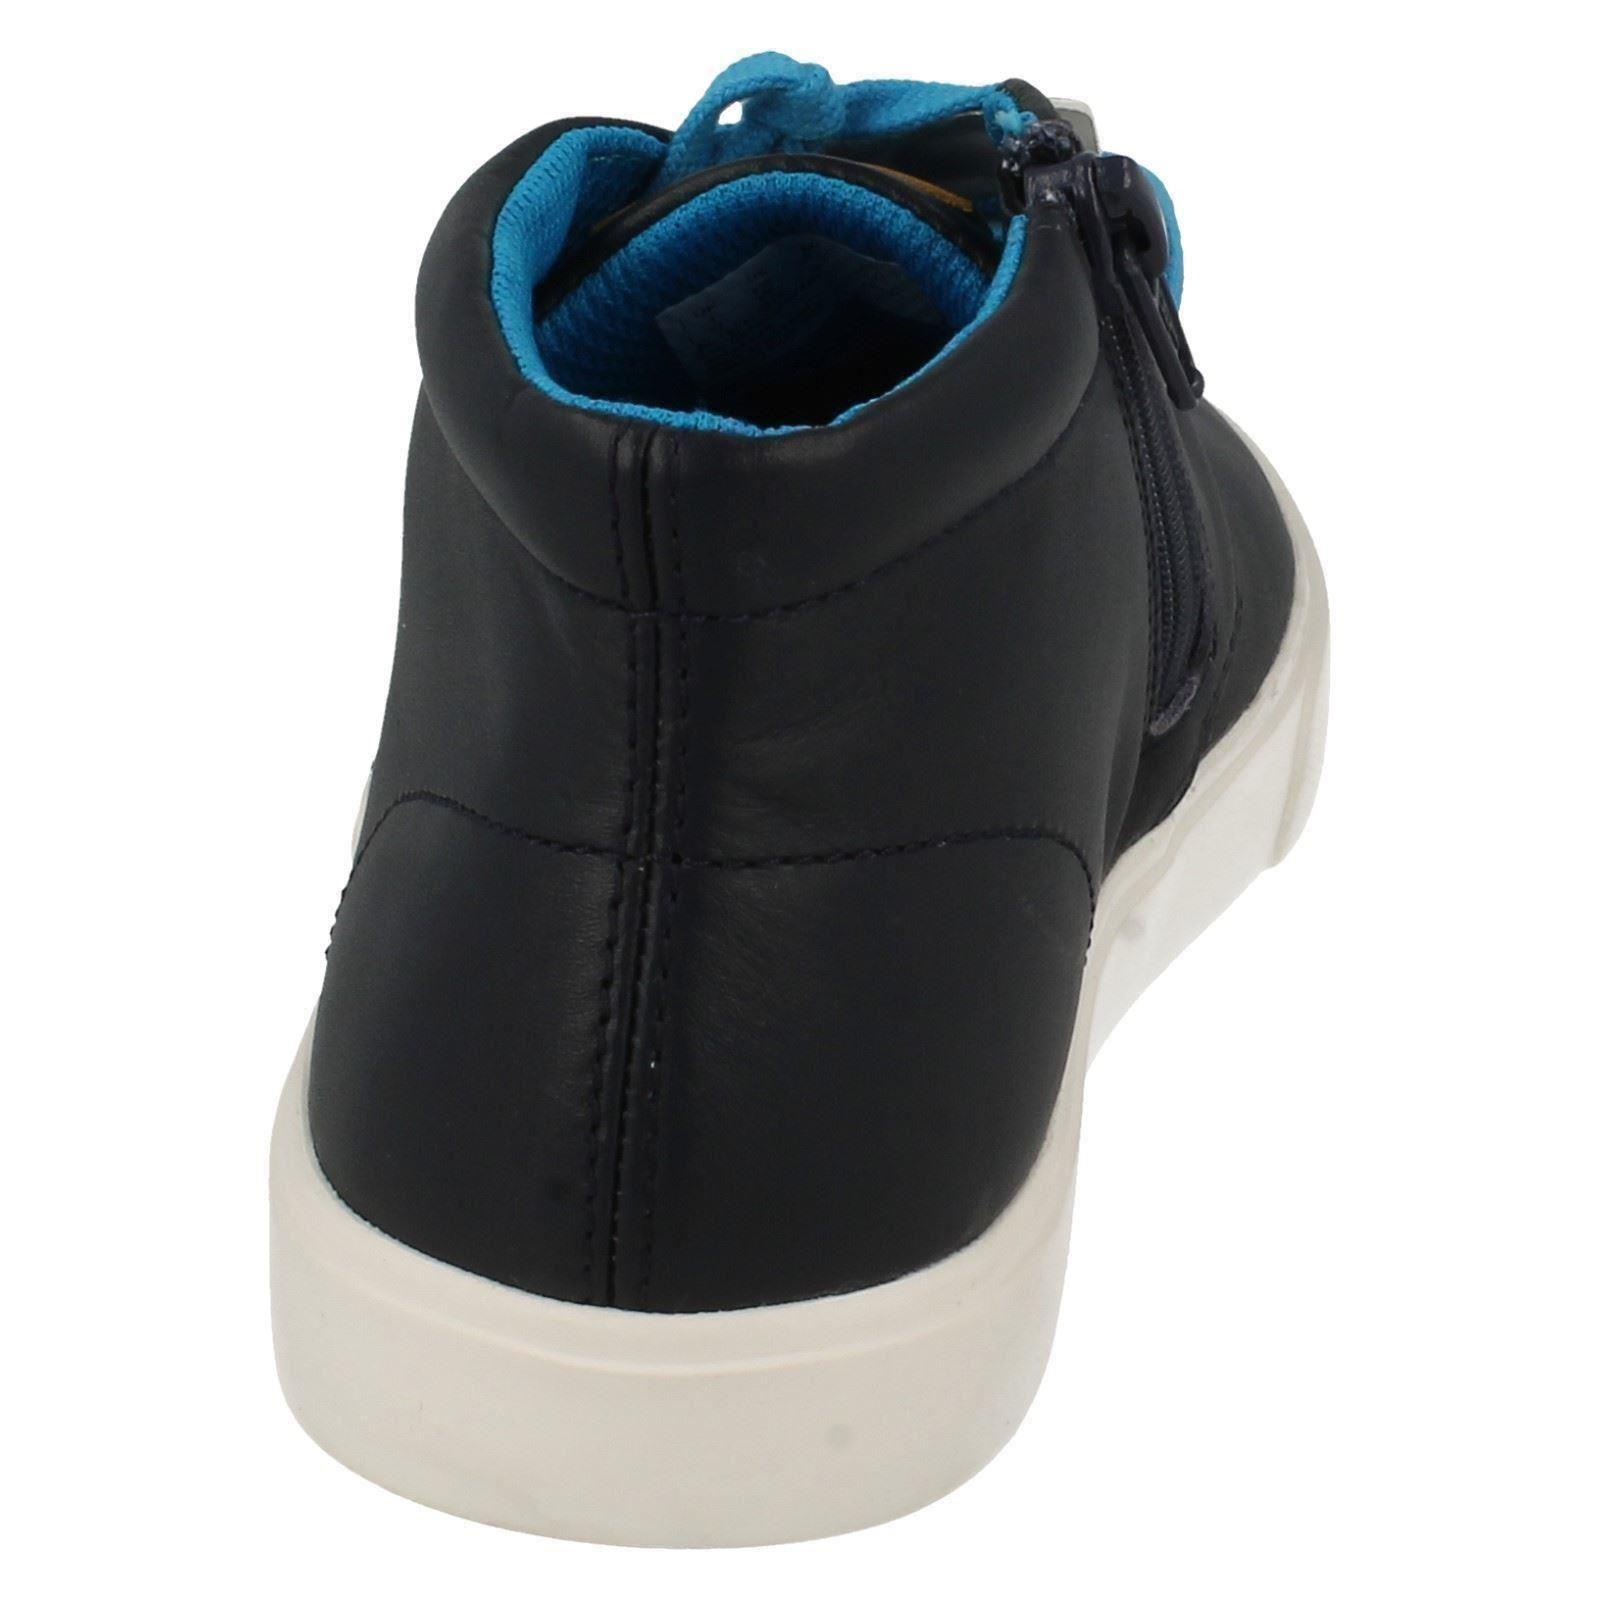 Botas casual Clarks tobillo de Trendy azul para Club Rise niños Navy RRO46wq